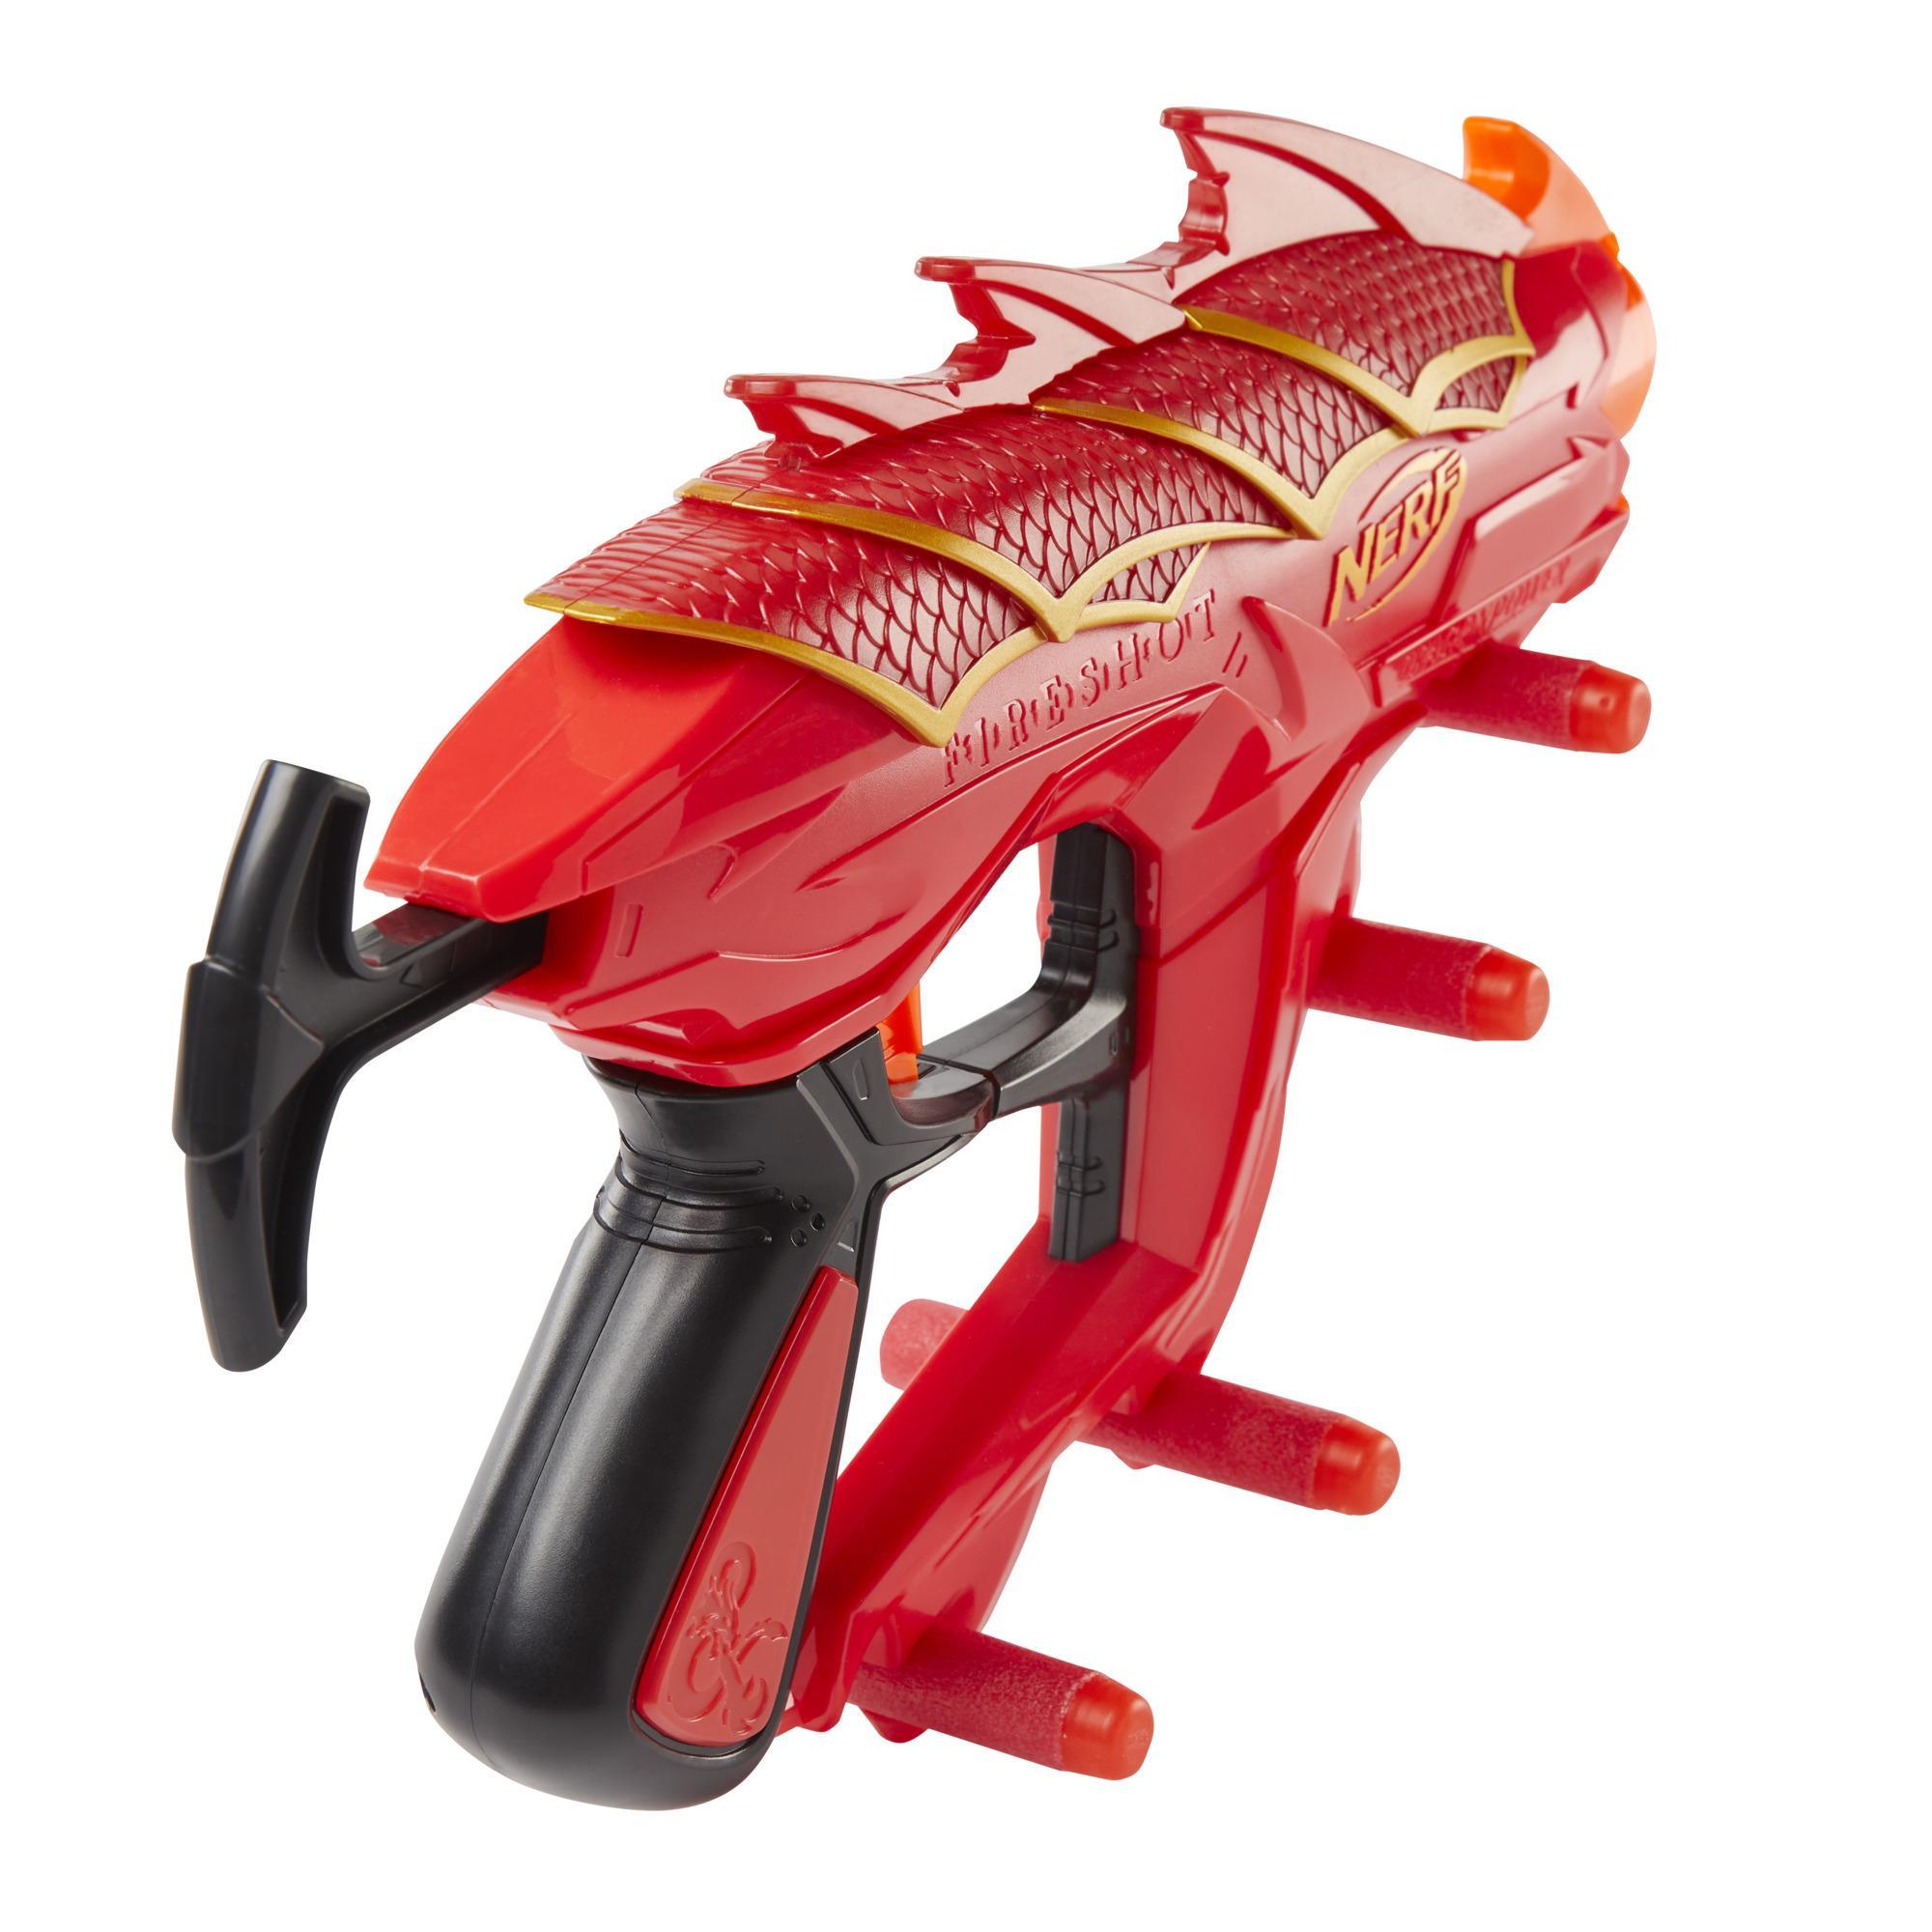 Nerf DragonPower Fireshot Dart Blaster, Inspired by Dungeons and Dragons, 5 Nerf Darts, 4-Dart Storage, Priming Handle